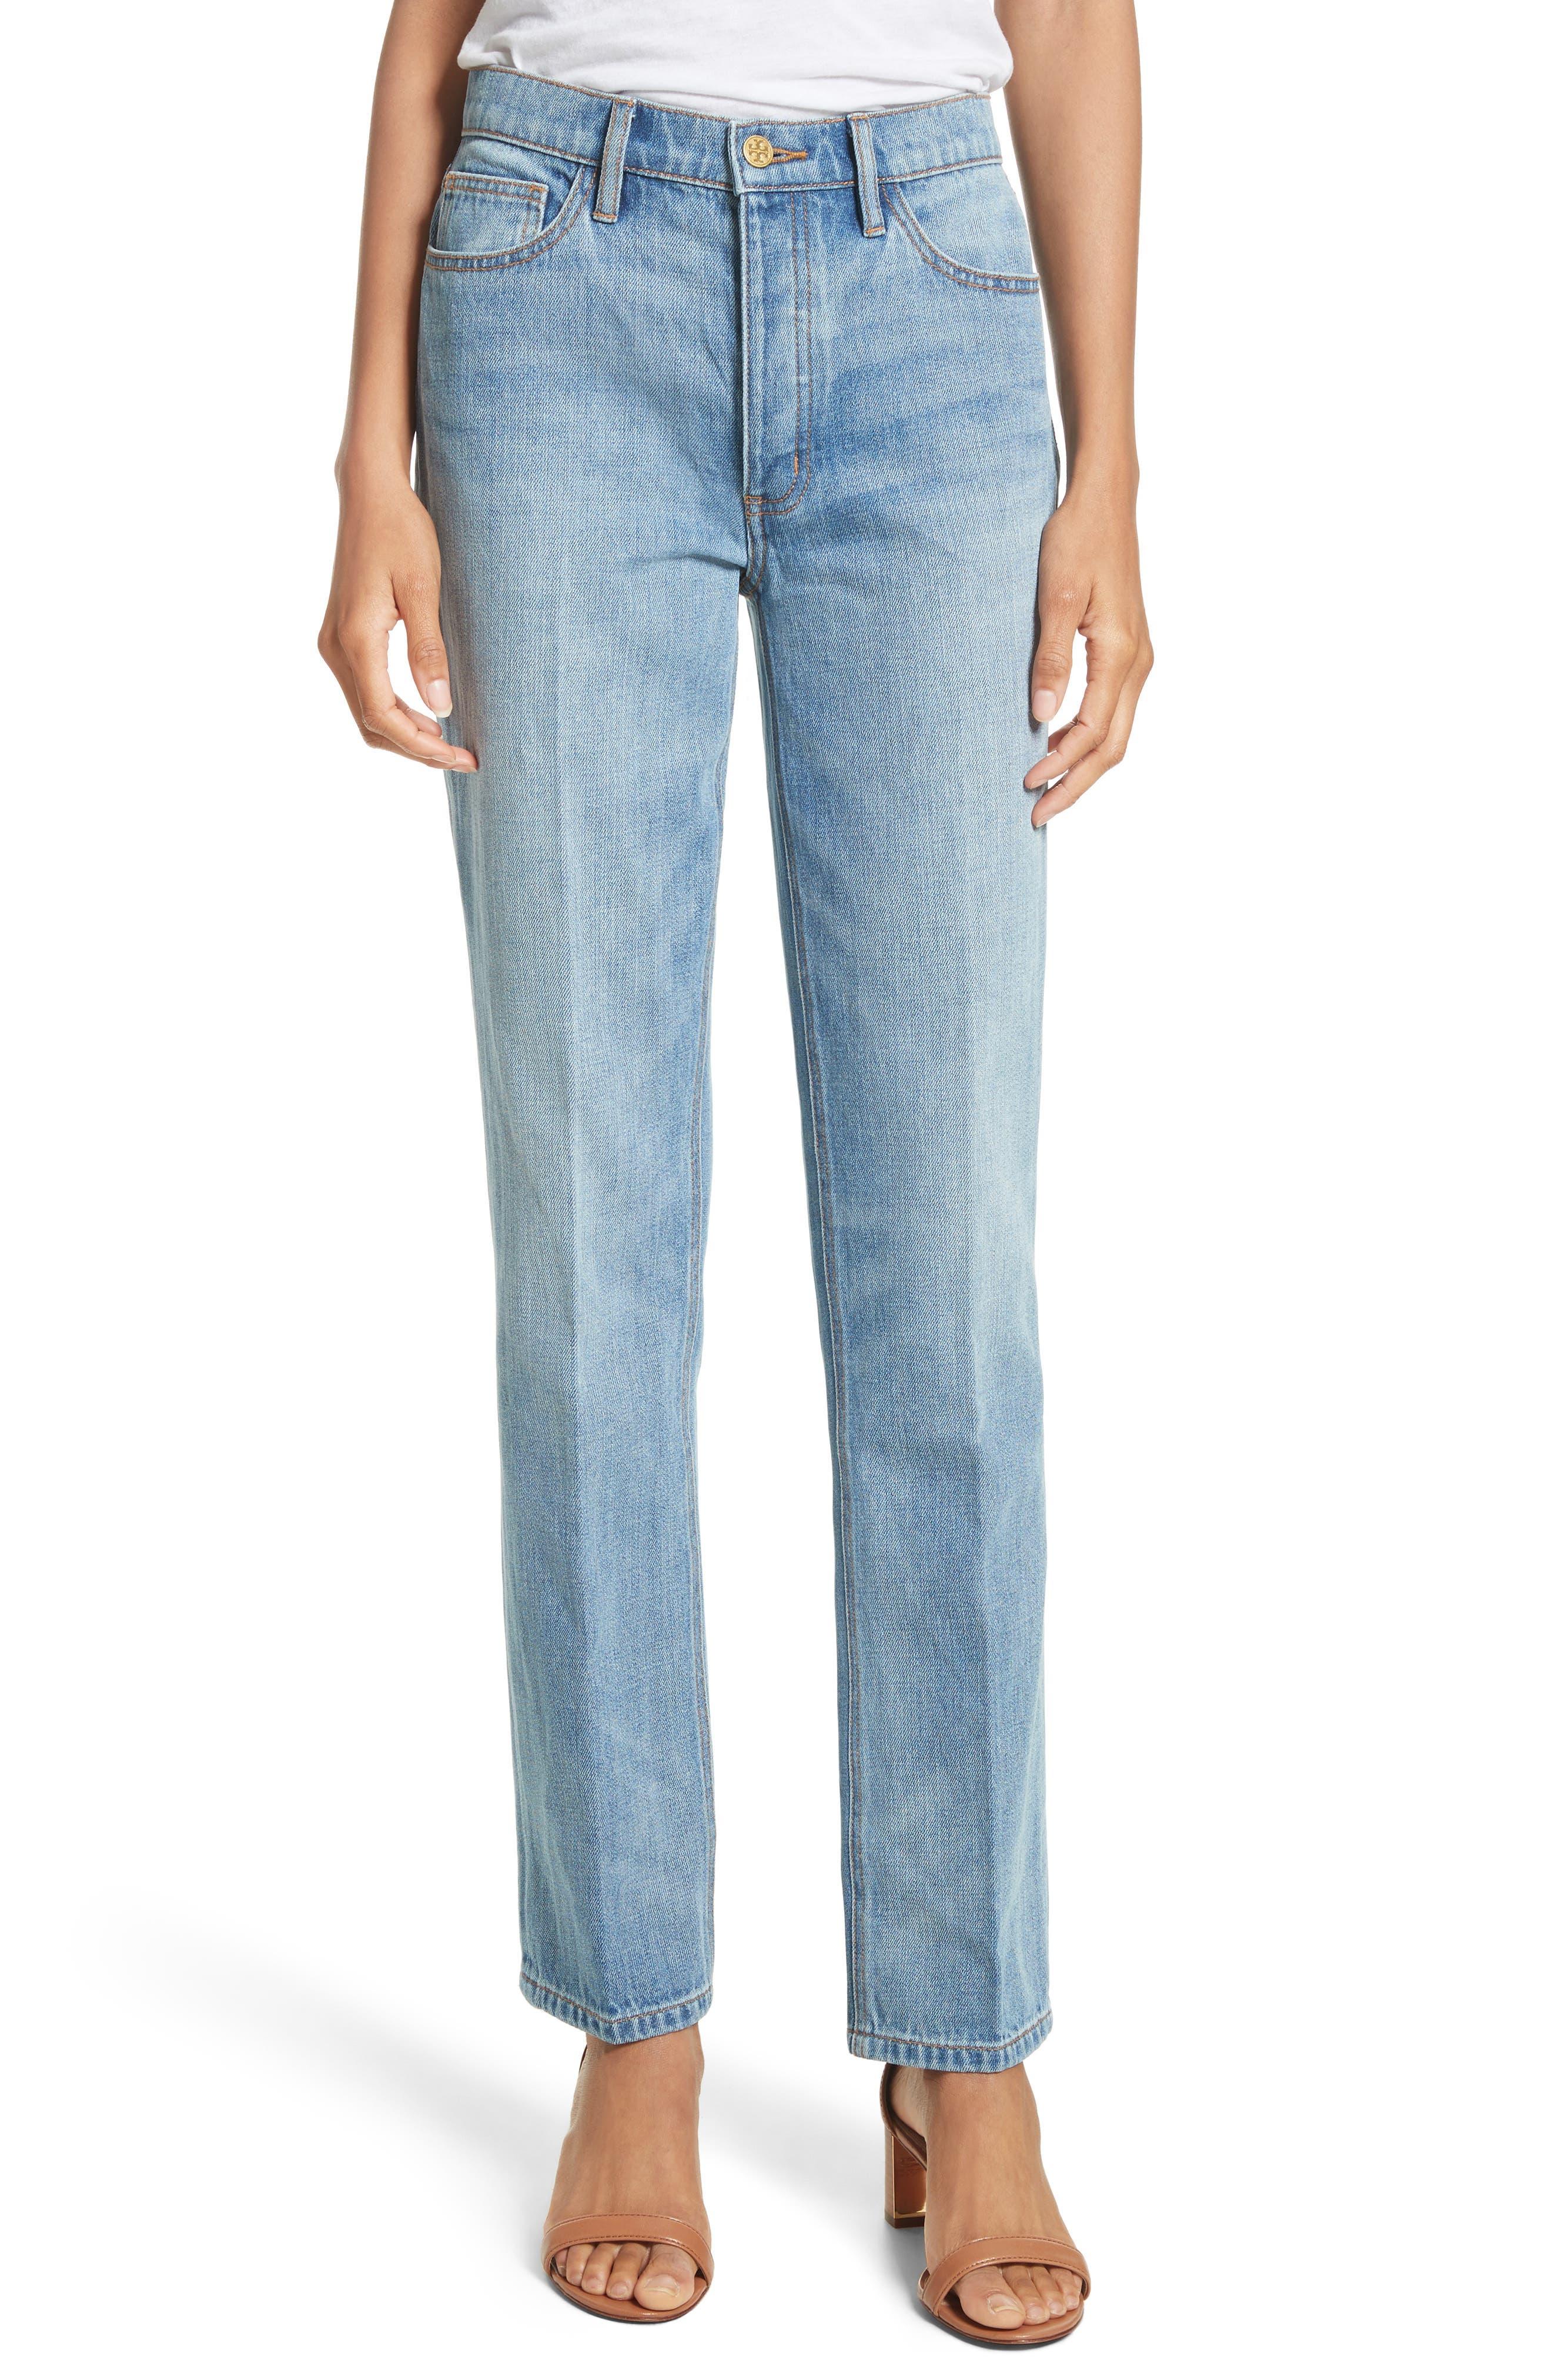 Betsy Straight Leg Jeans,                         Main,                         color, Dusk Blue Wash